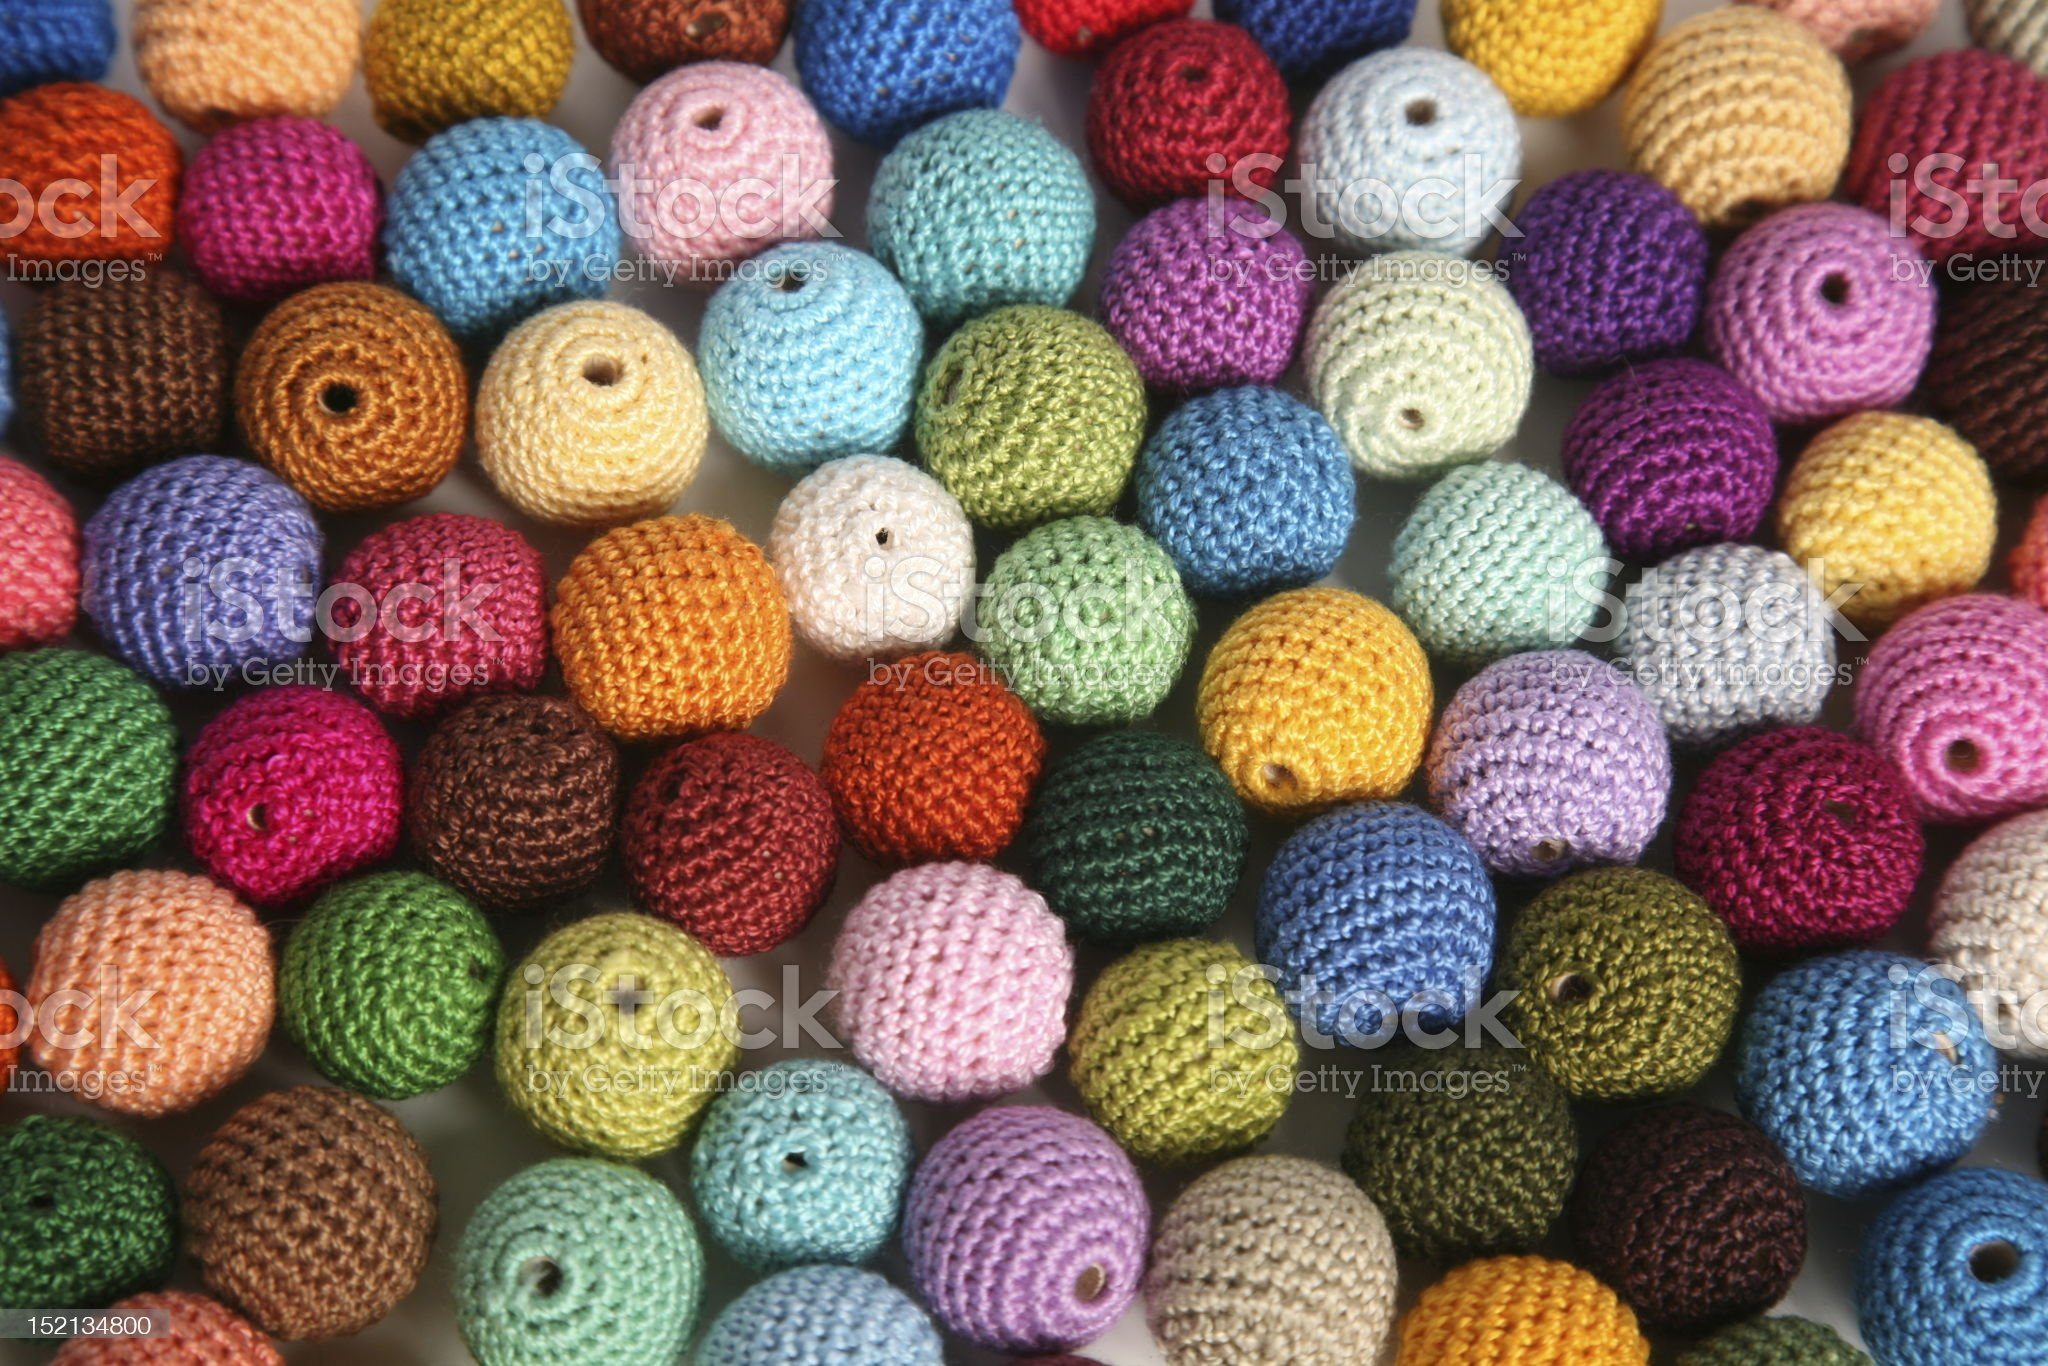 Crochet cotton beads royalty-free stock photo